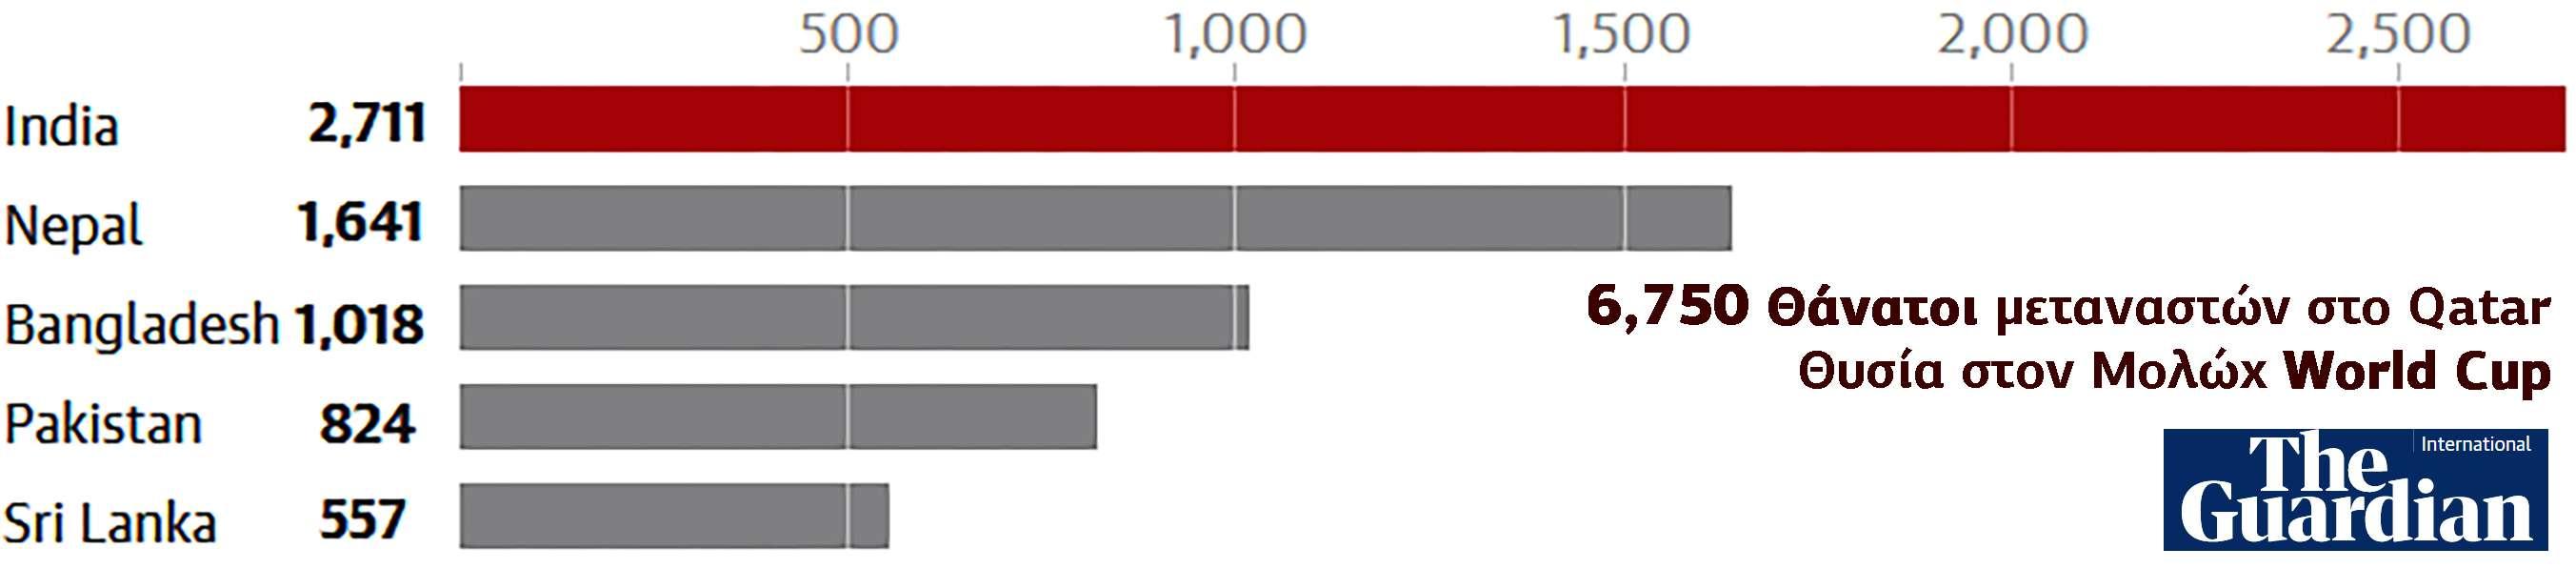 Qatar 6750 dead Mundial 2022